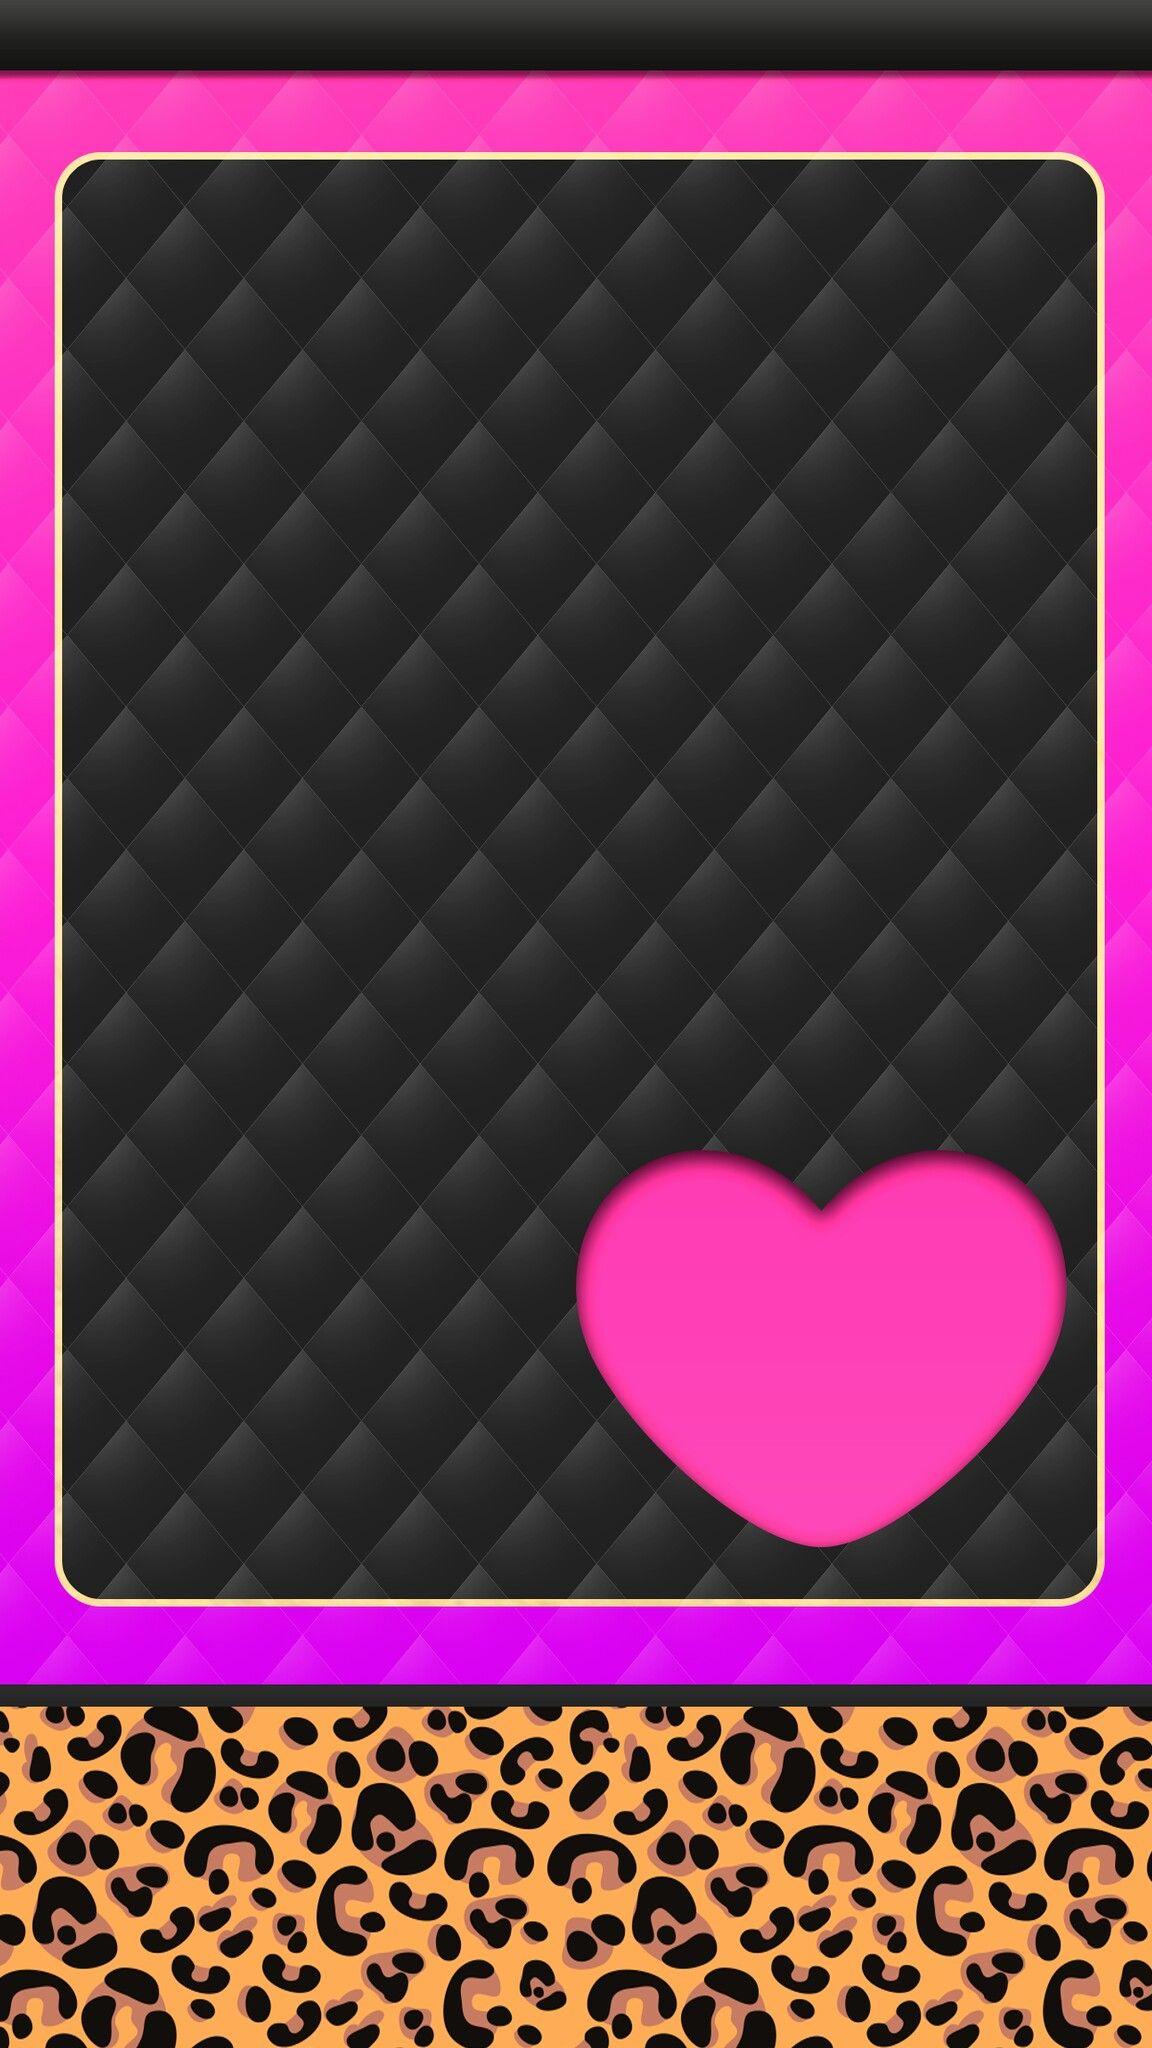 Download Wallpaper Hello Kitty Gray - 34af25a082e9520b206b9c265cc8e8c2  Collection_475858.jpg